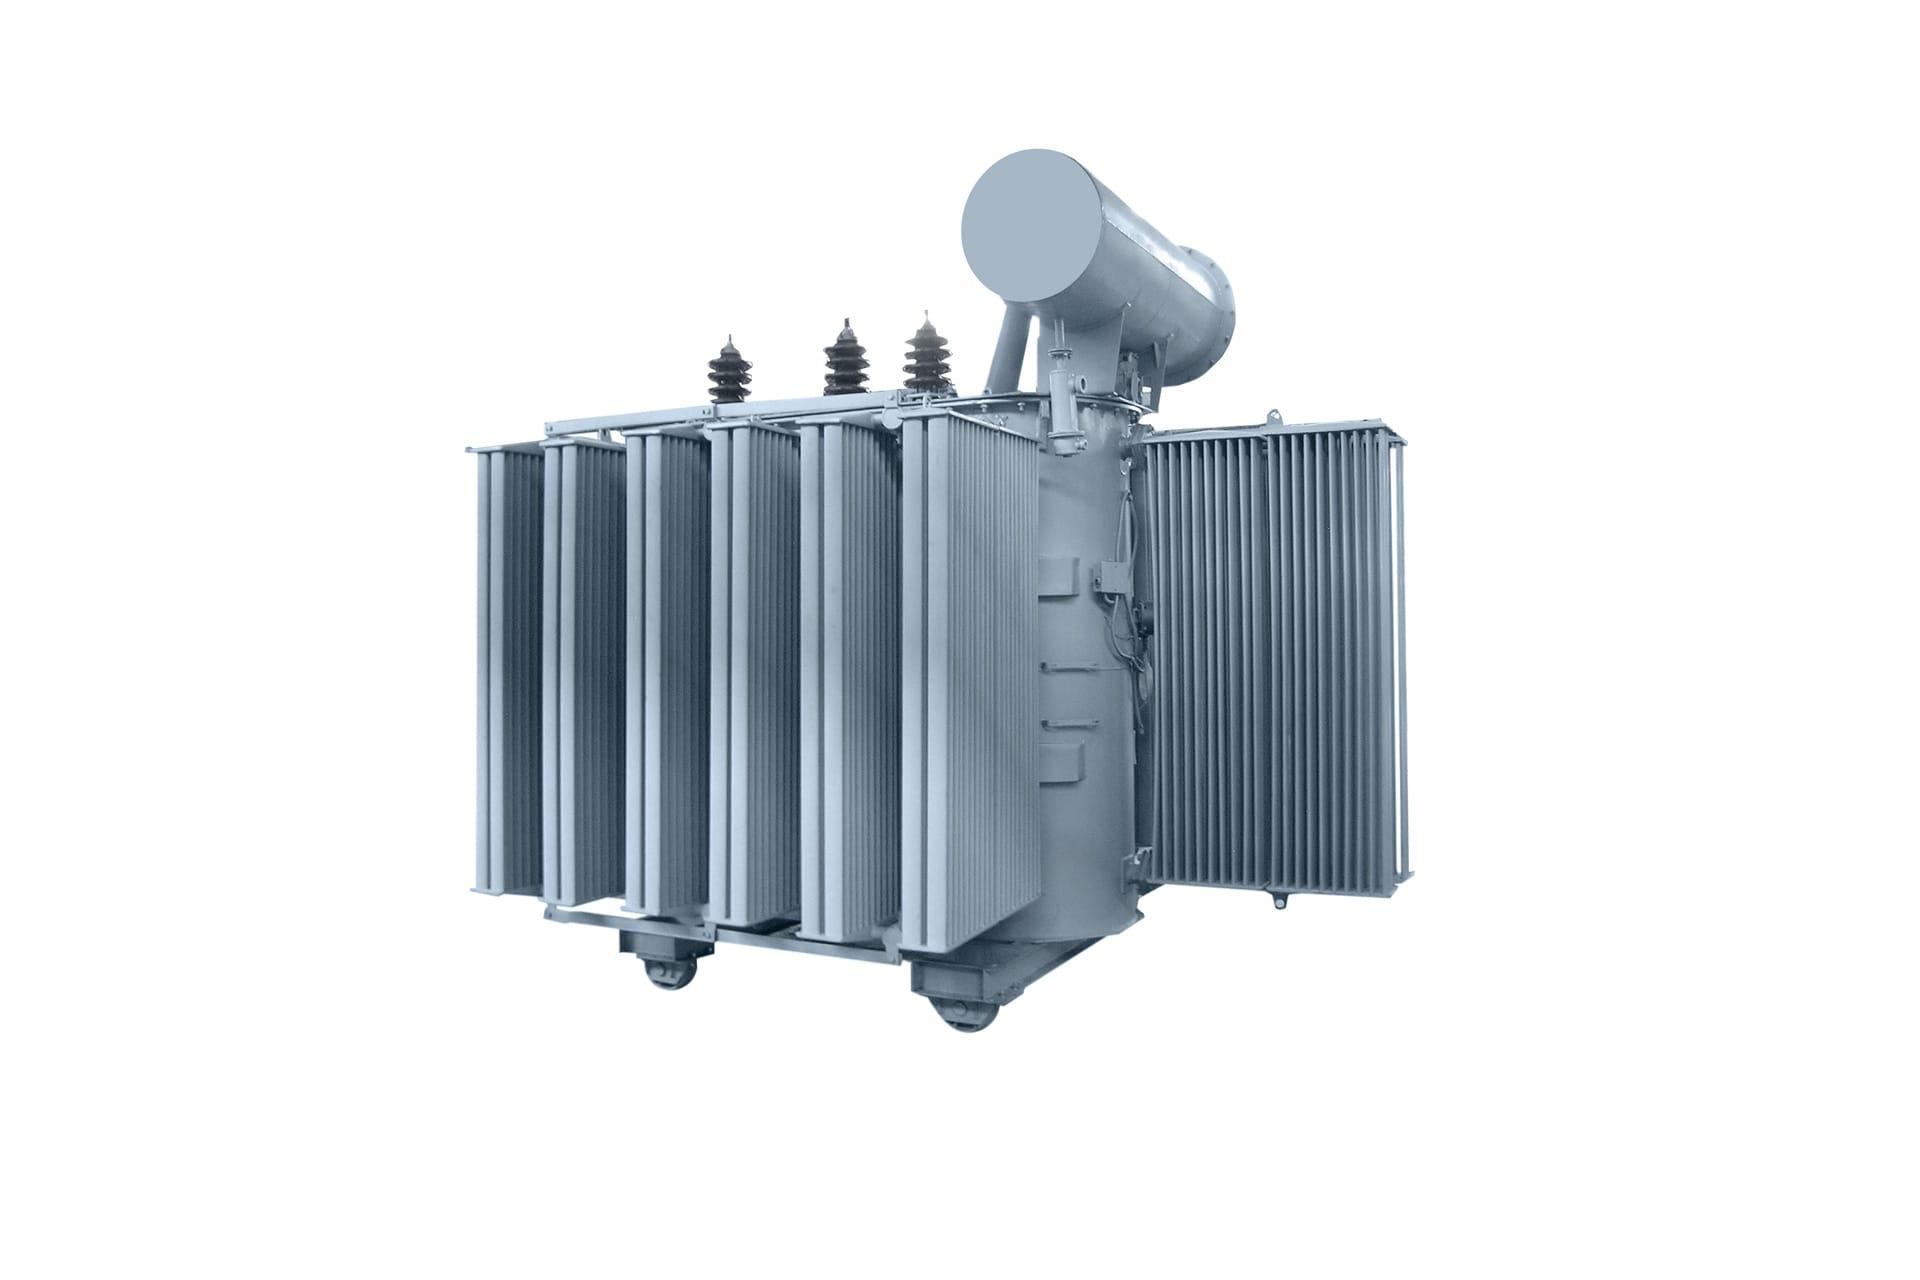 Ensons - Общий вид масляного трансформатора ТМ 35 кВ